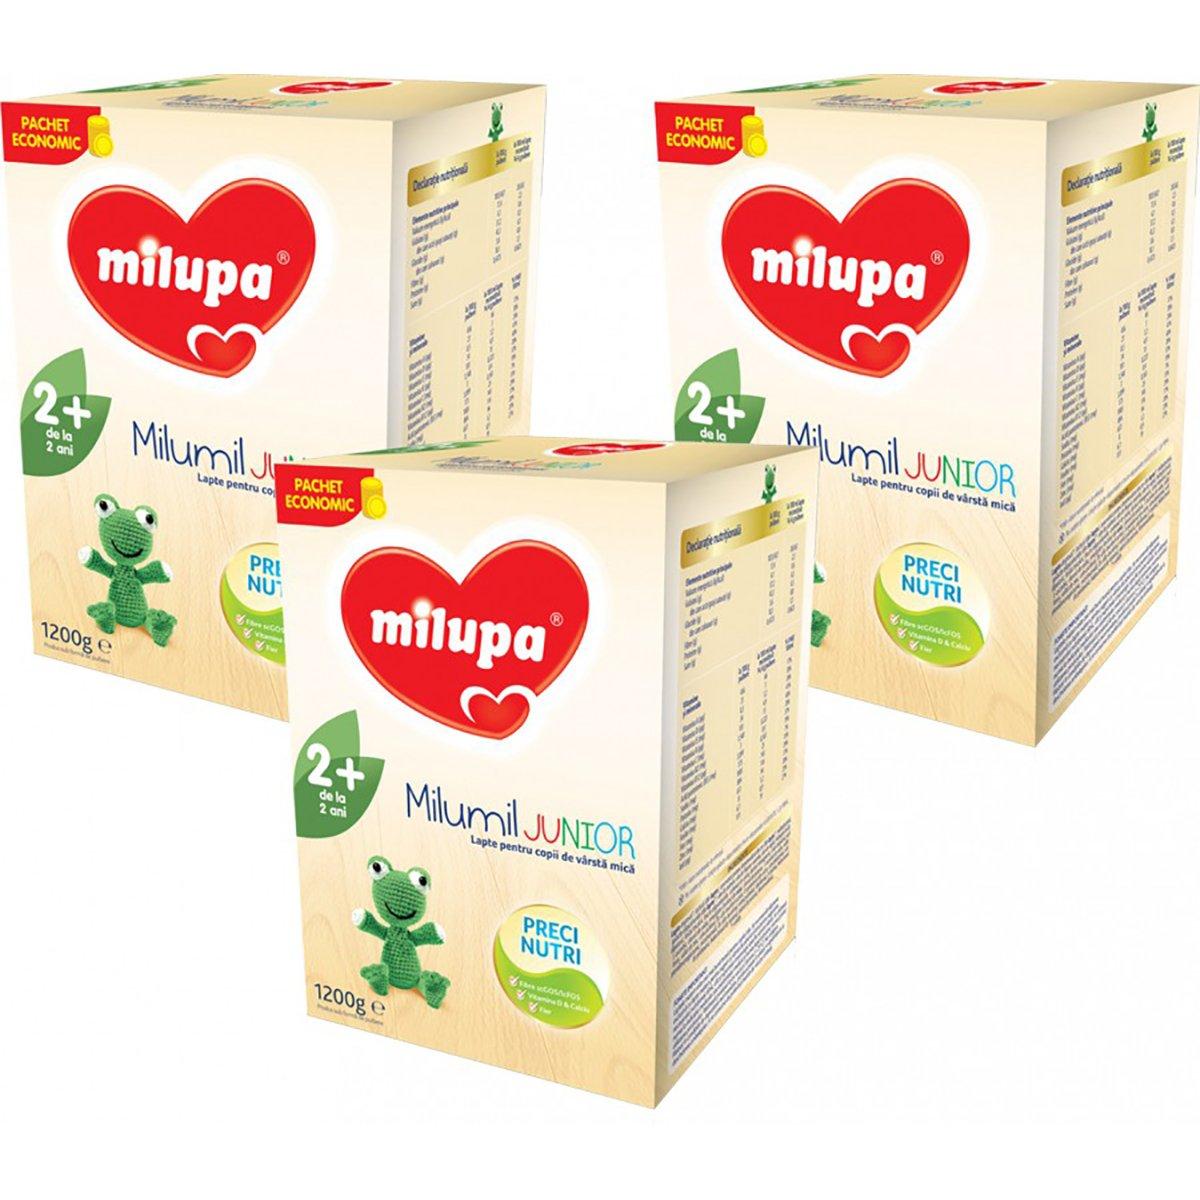 Lapte praf Milupa Milumil Junior 2+, 3 pachete x 1200 g